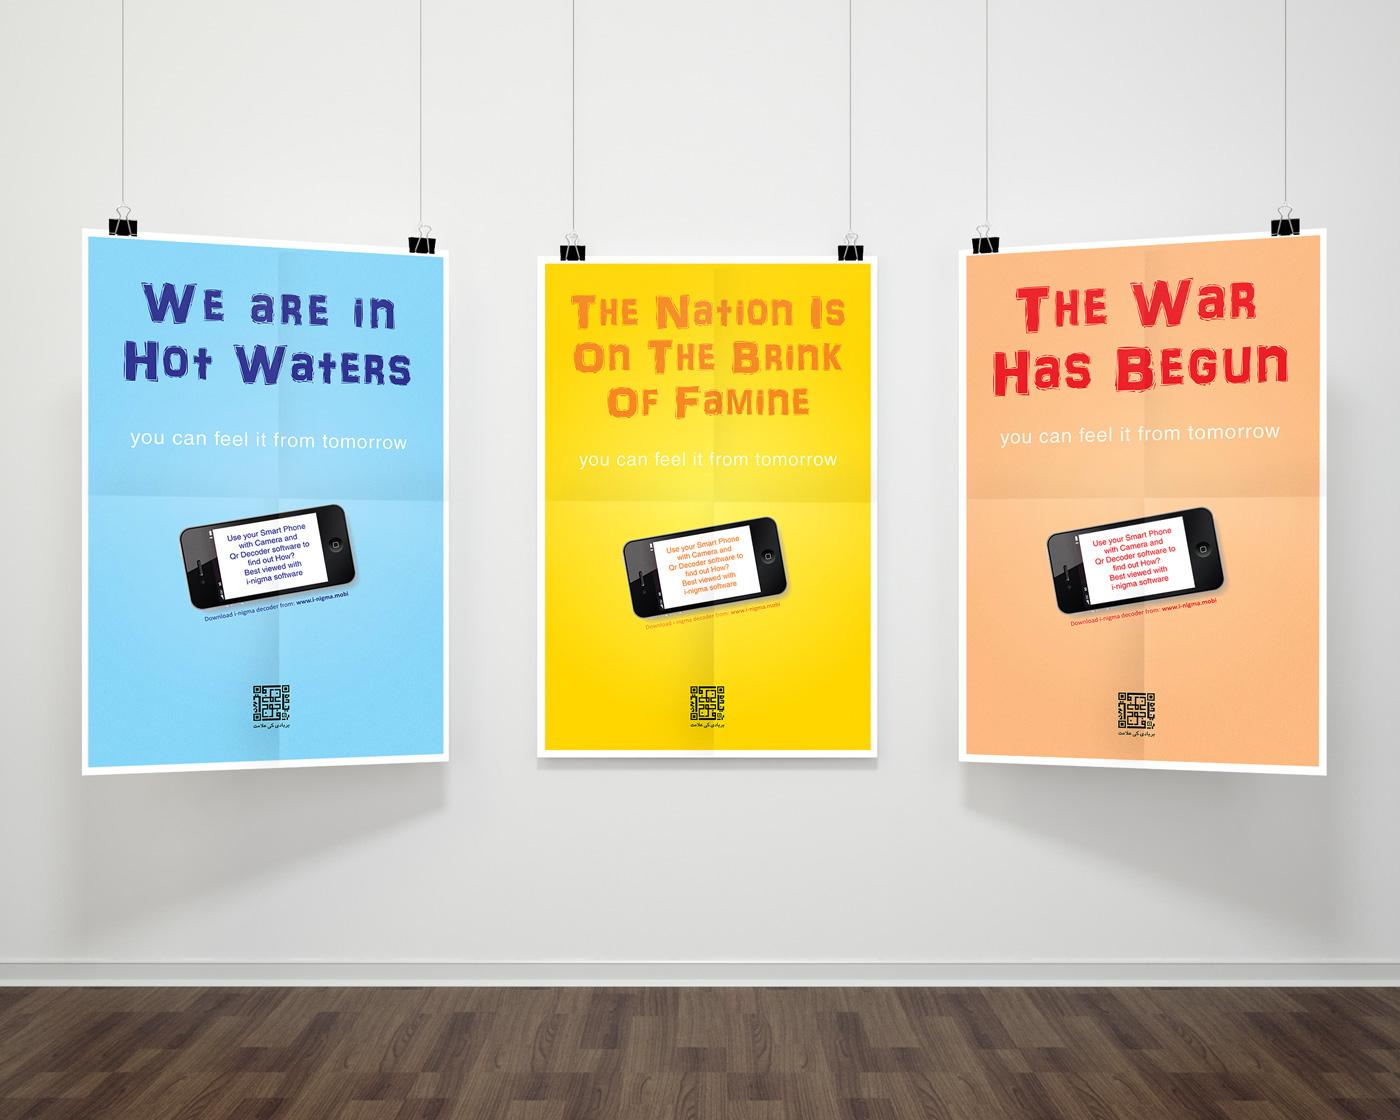 Yajuj Majuj gog magog graphic design Illustrator thesis poster qr code